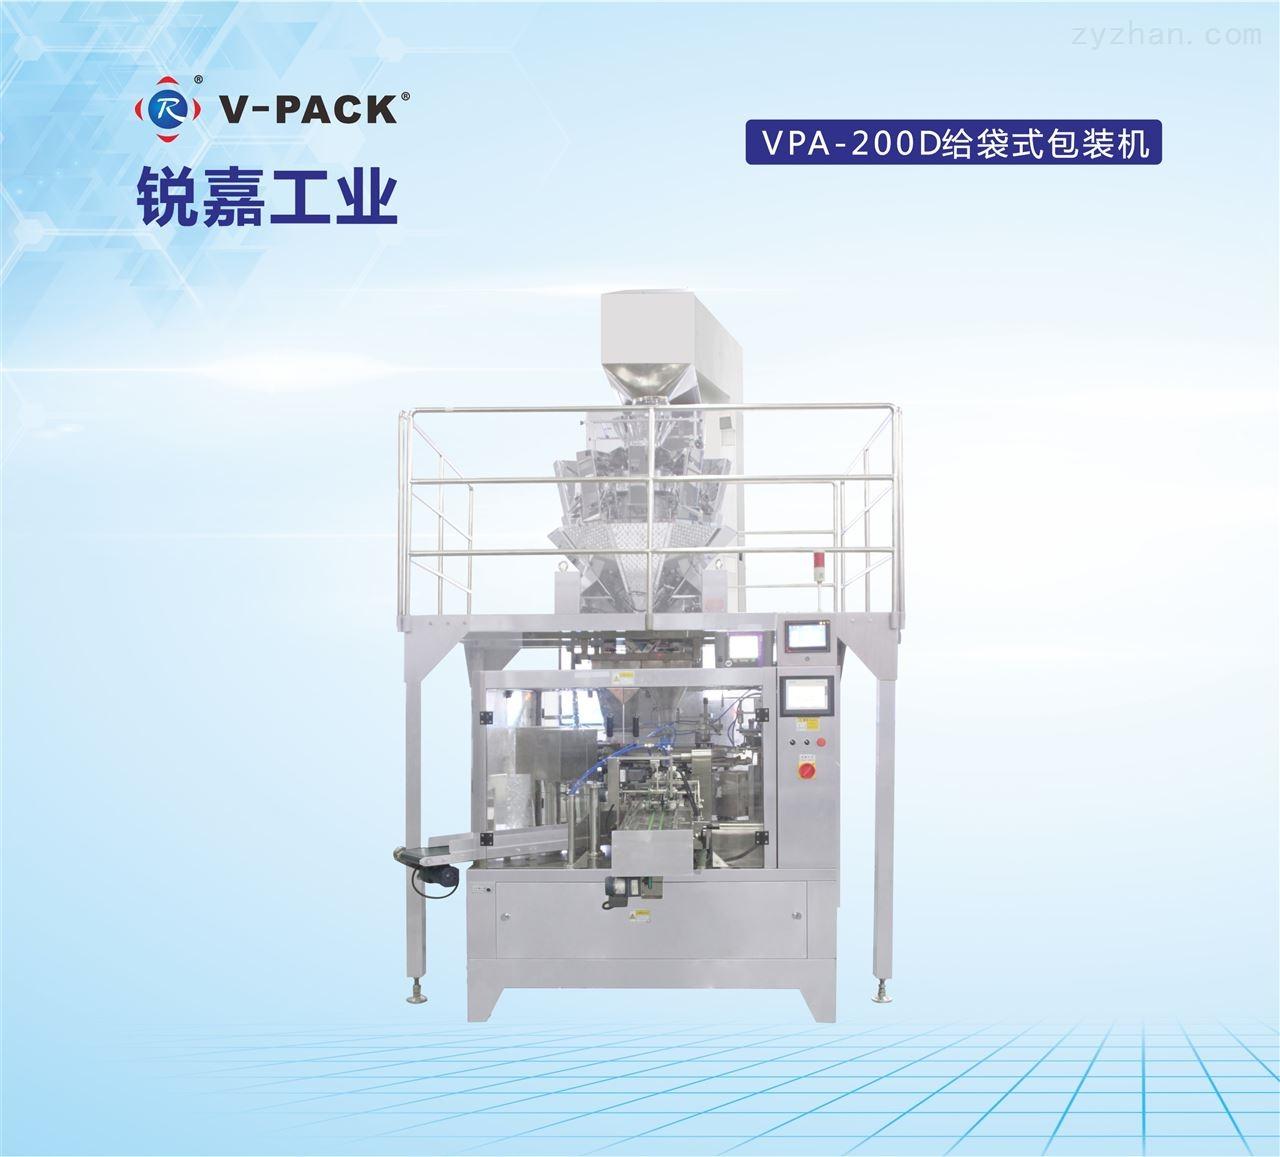 VPA-200D 中药饮片给袋式包装机